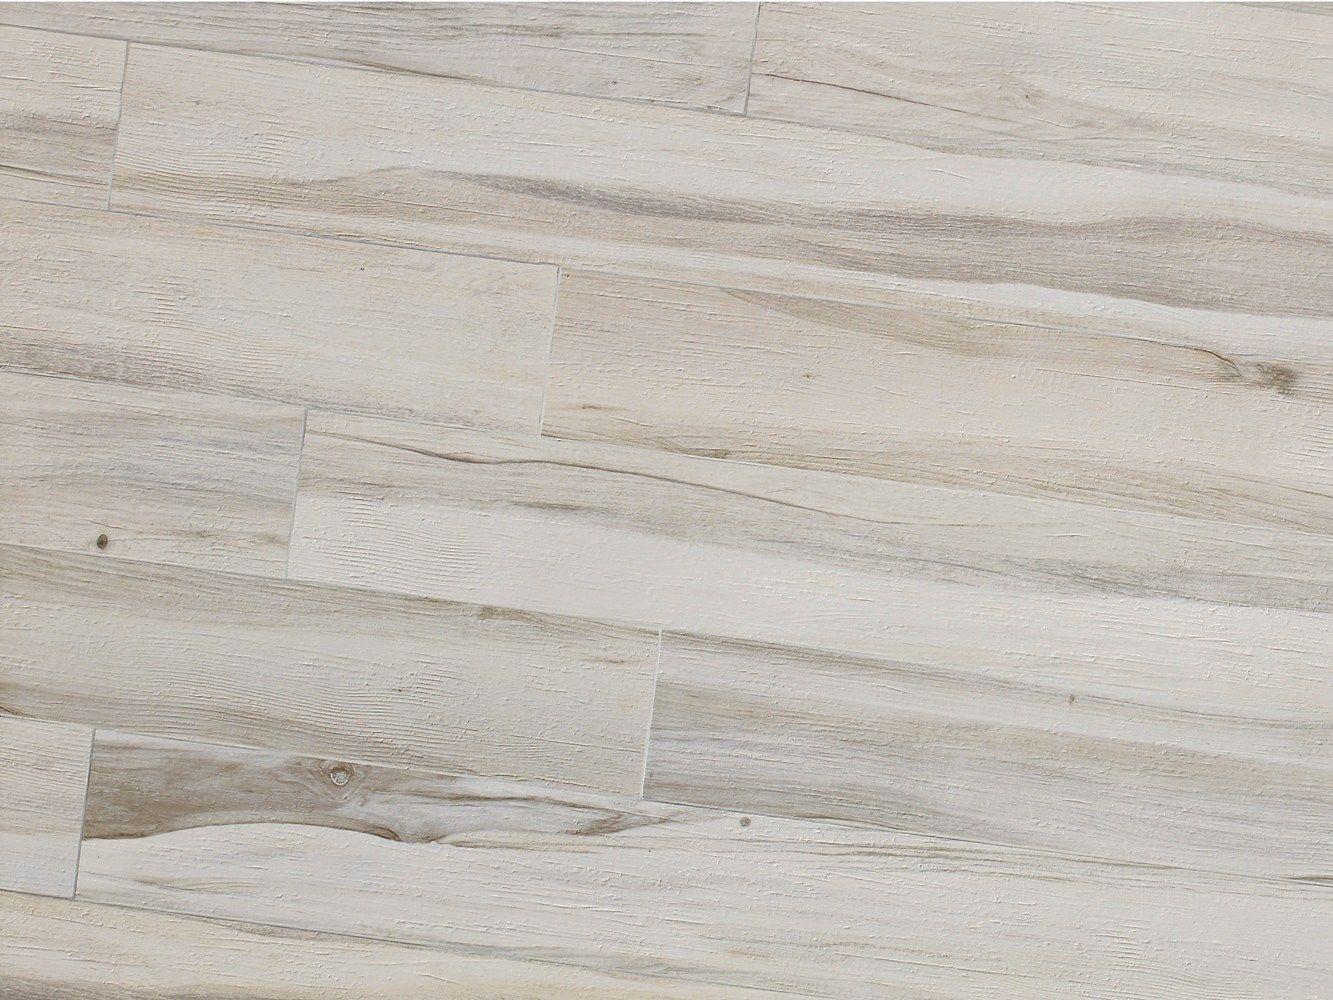 Pavimento de gres porcel nico imitaci n madera maxiwood - Pavimento imitacion madera ...